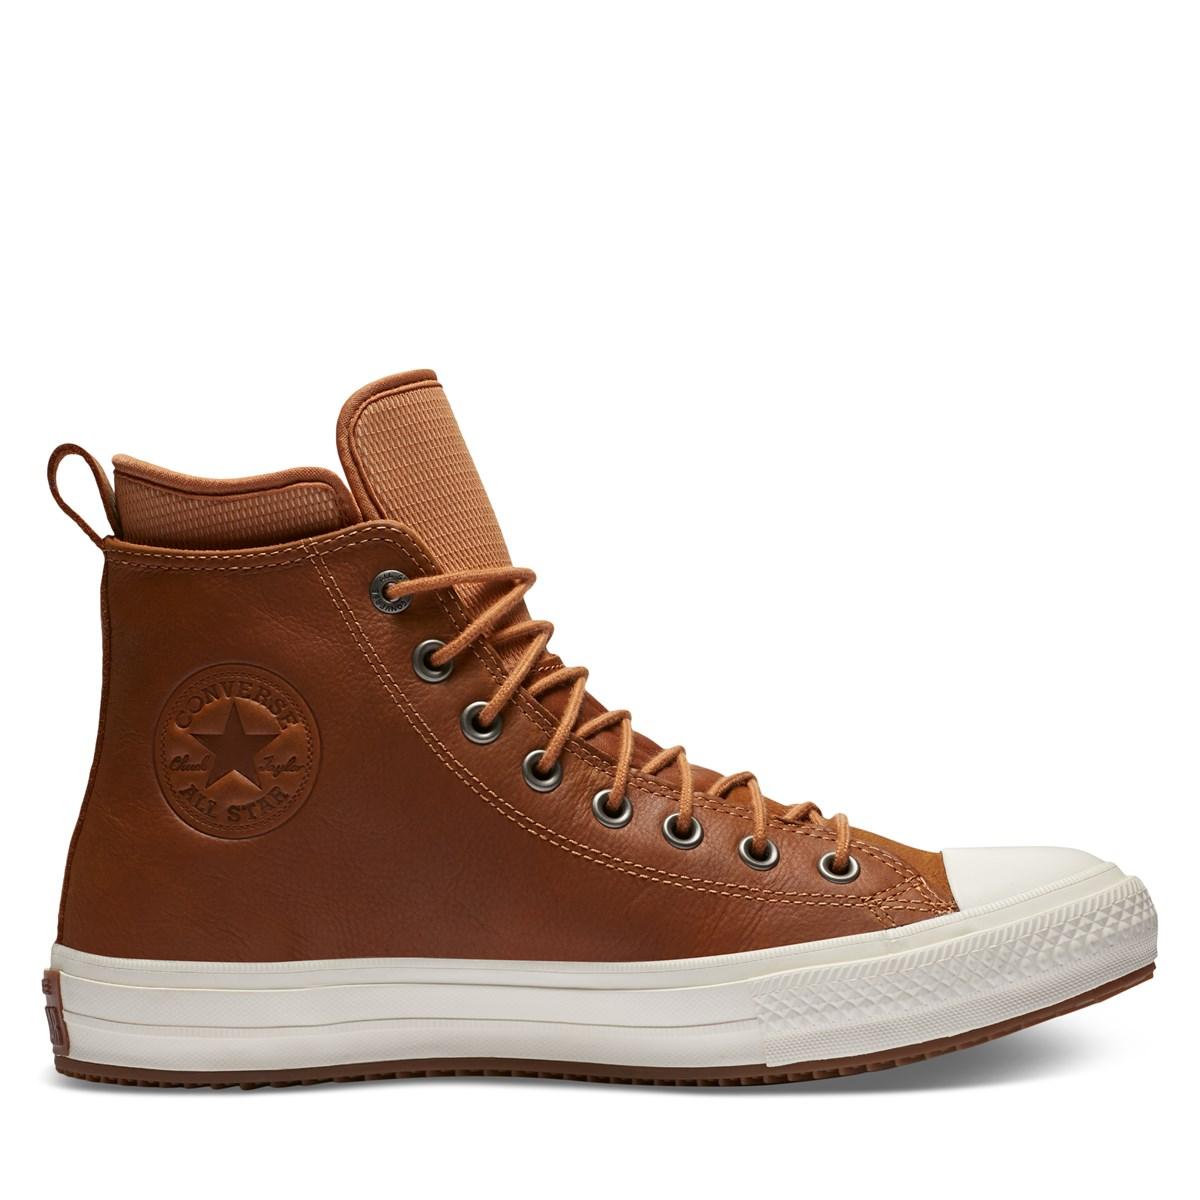 Reebok Women Shoes Camel